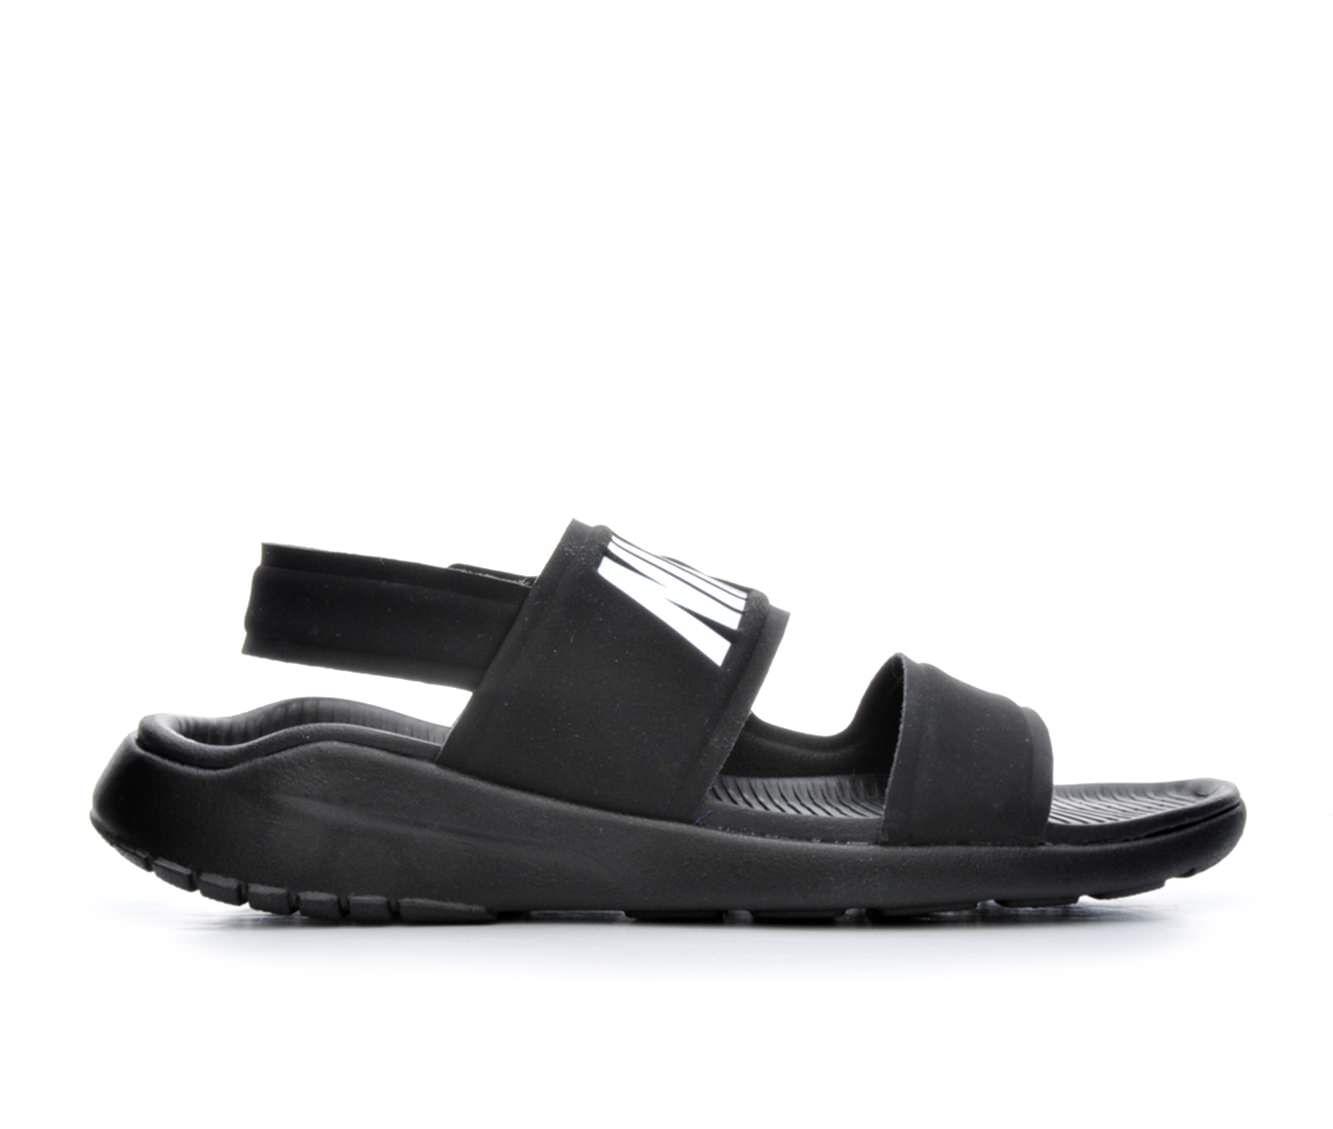 Women's Nike Tanjun Sandal Sport Sandals Black/White